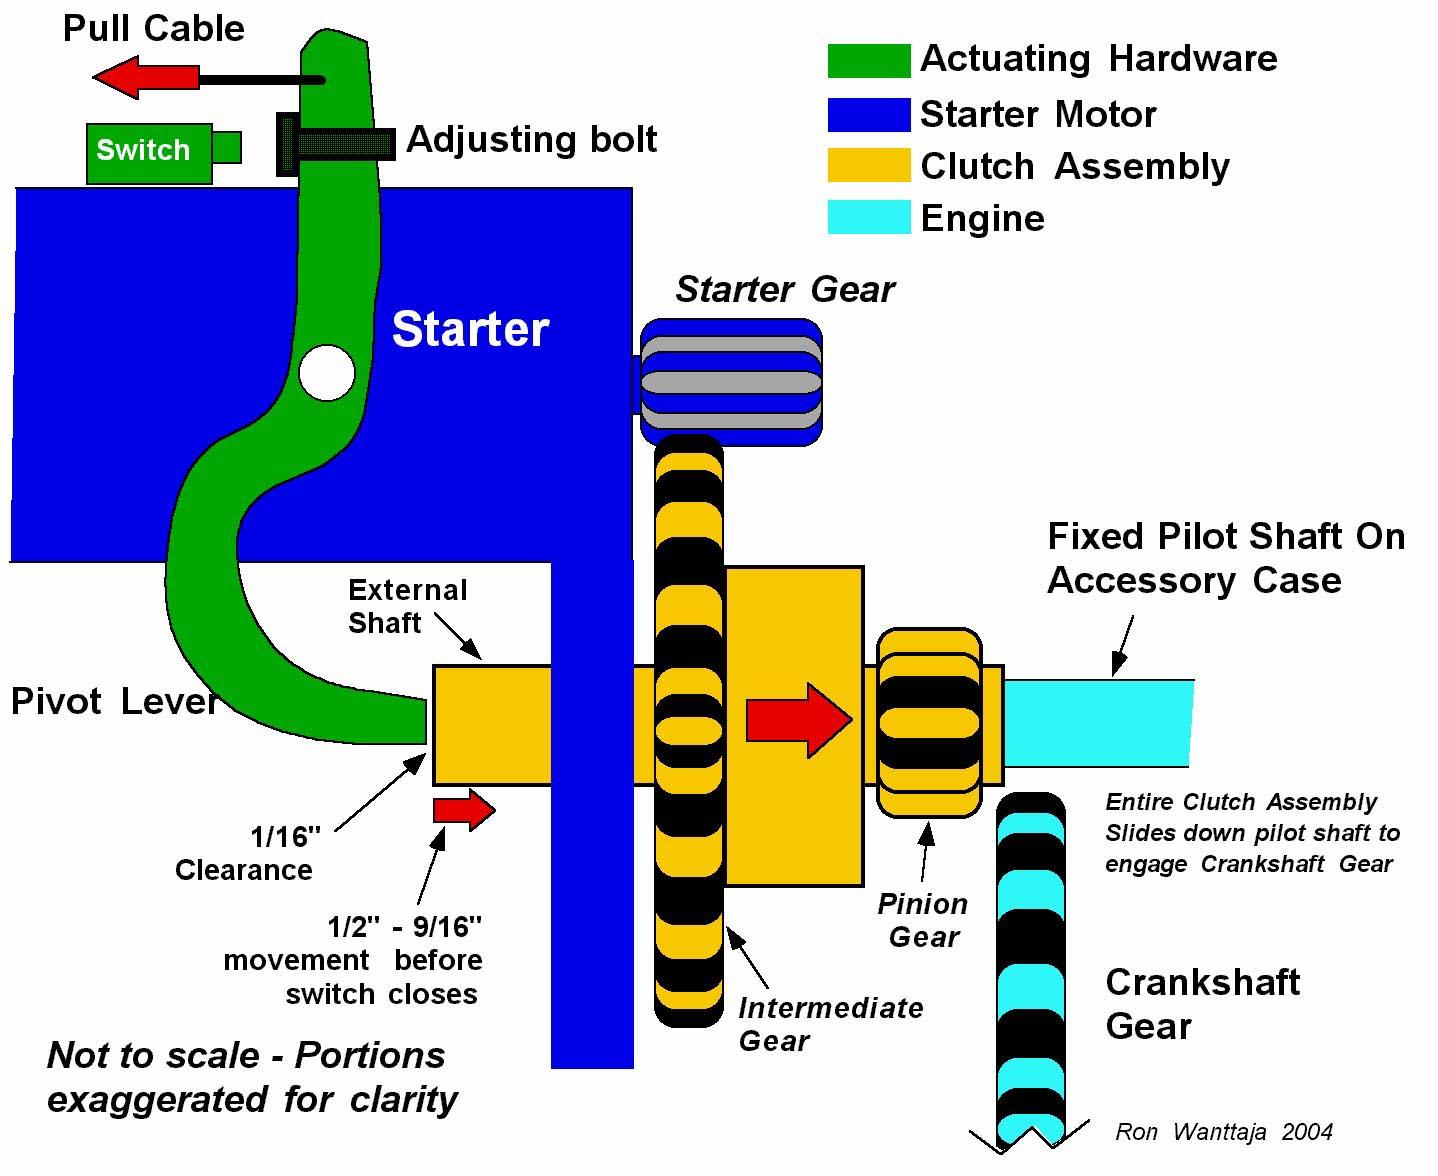 Engine clutch shaft engine free engine image for user for How a starter motor works